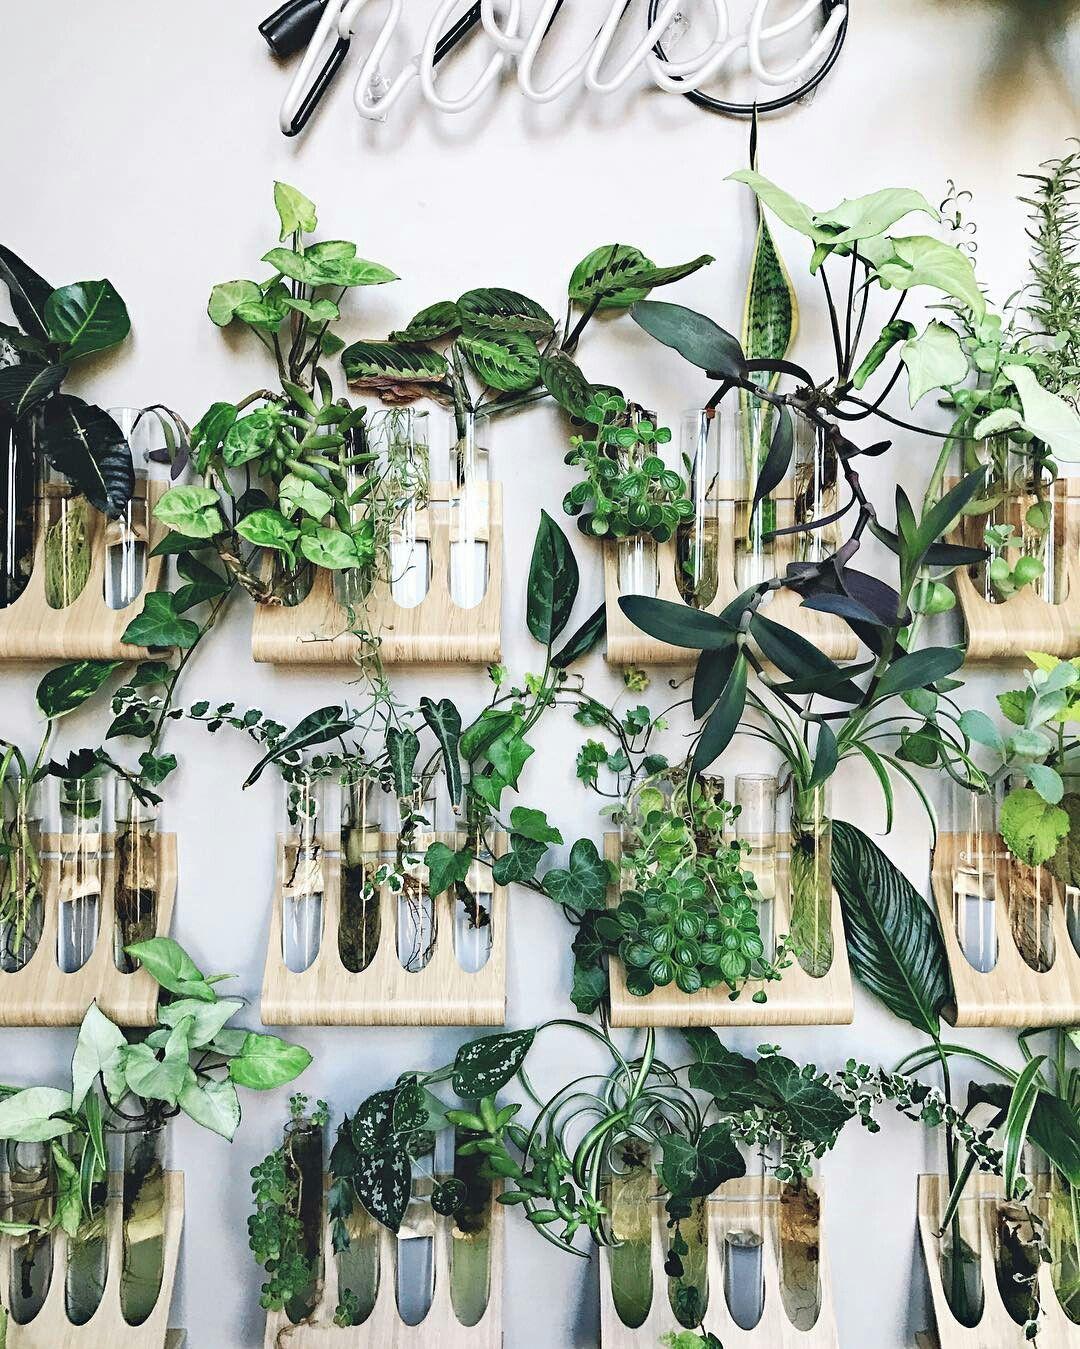 Ikea hacks rimforsa hilyoncarter kert t likert Plantillas decorativas ikea